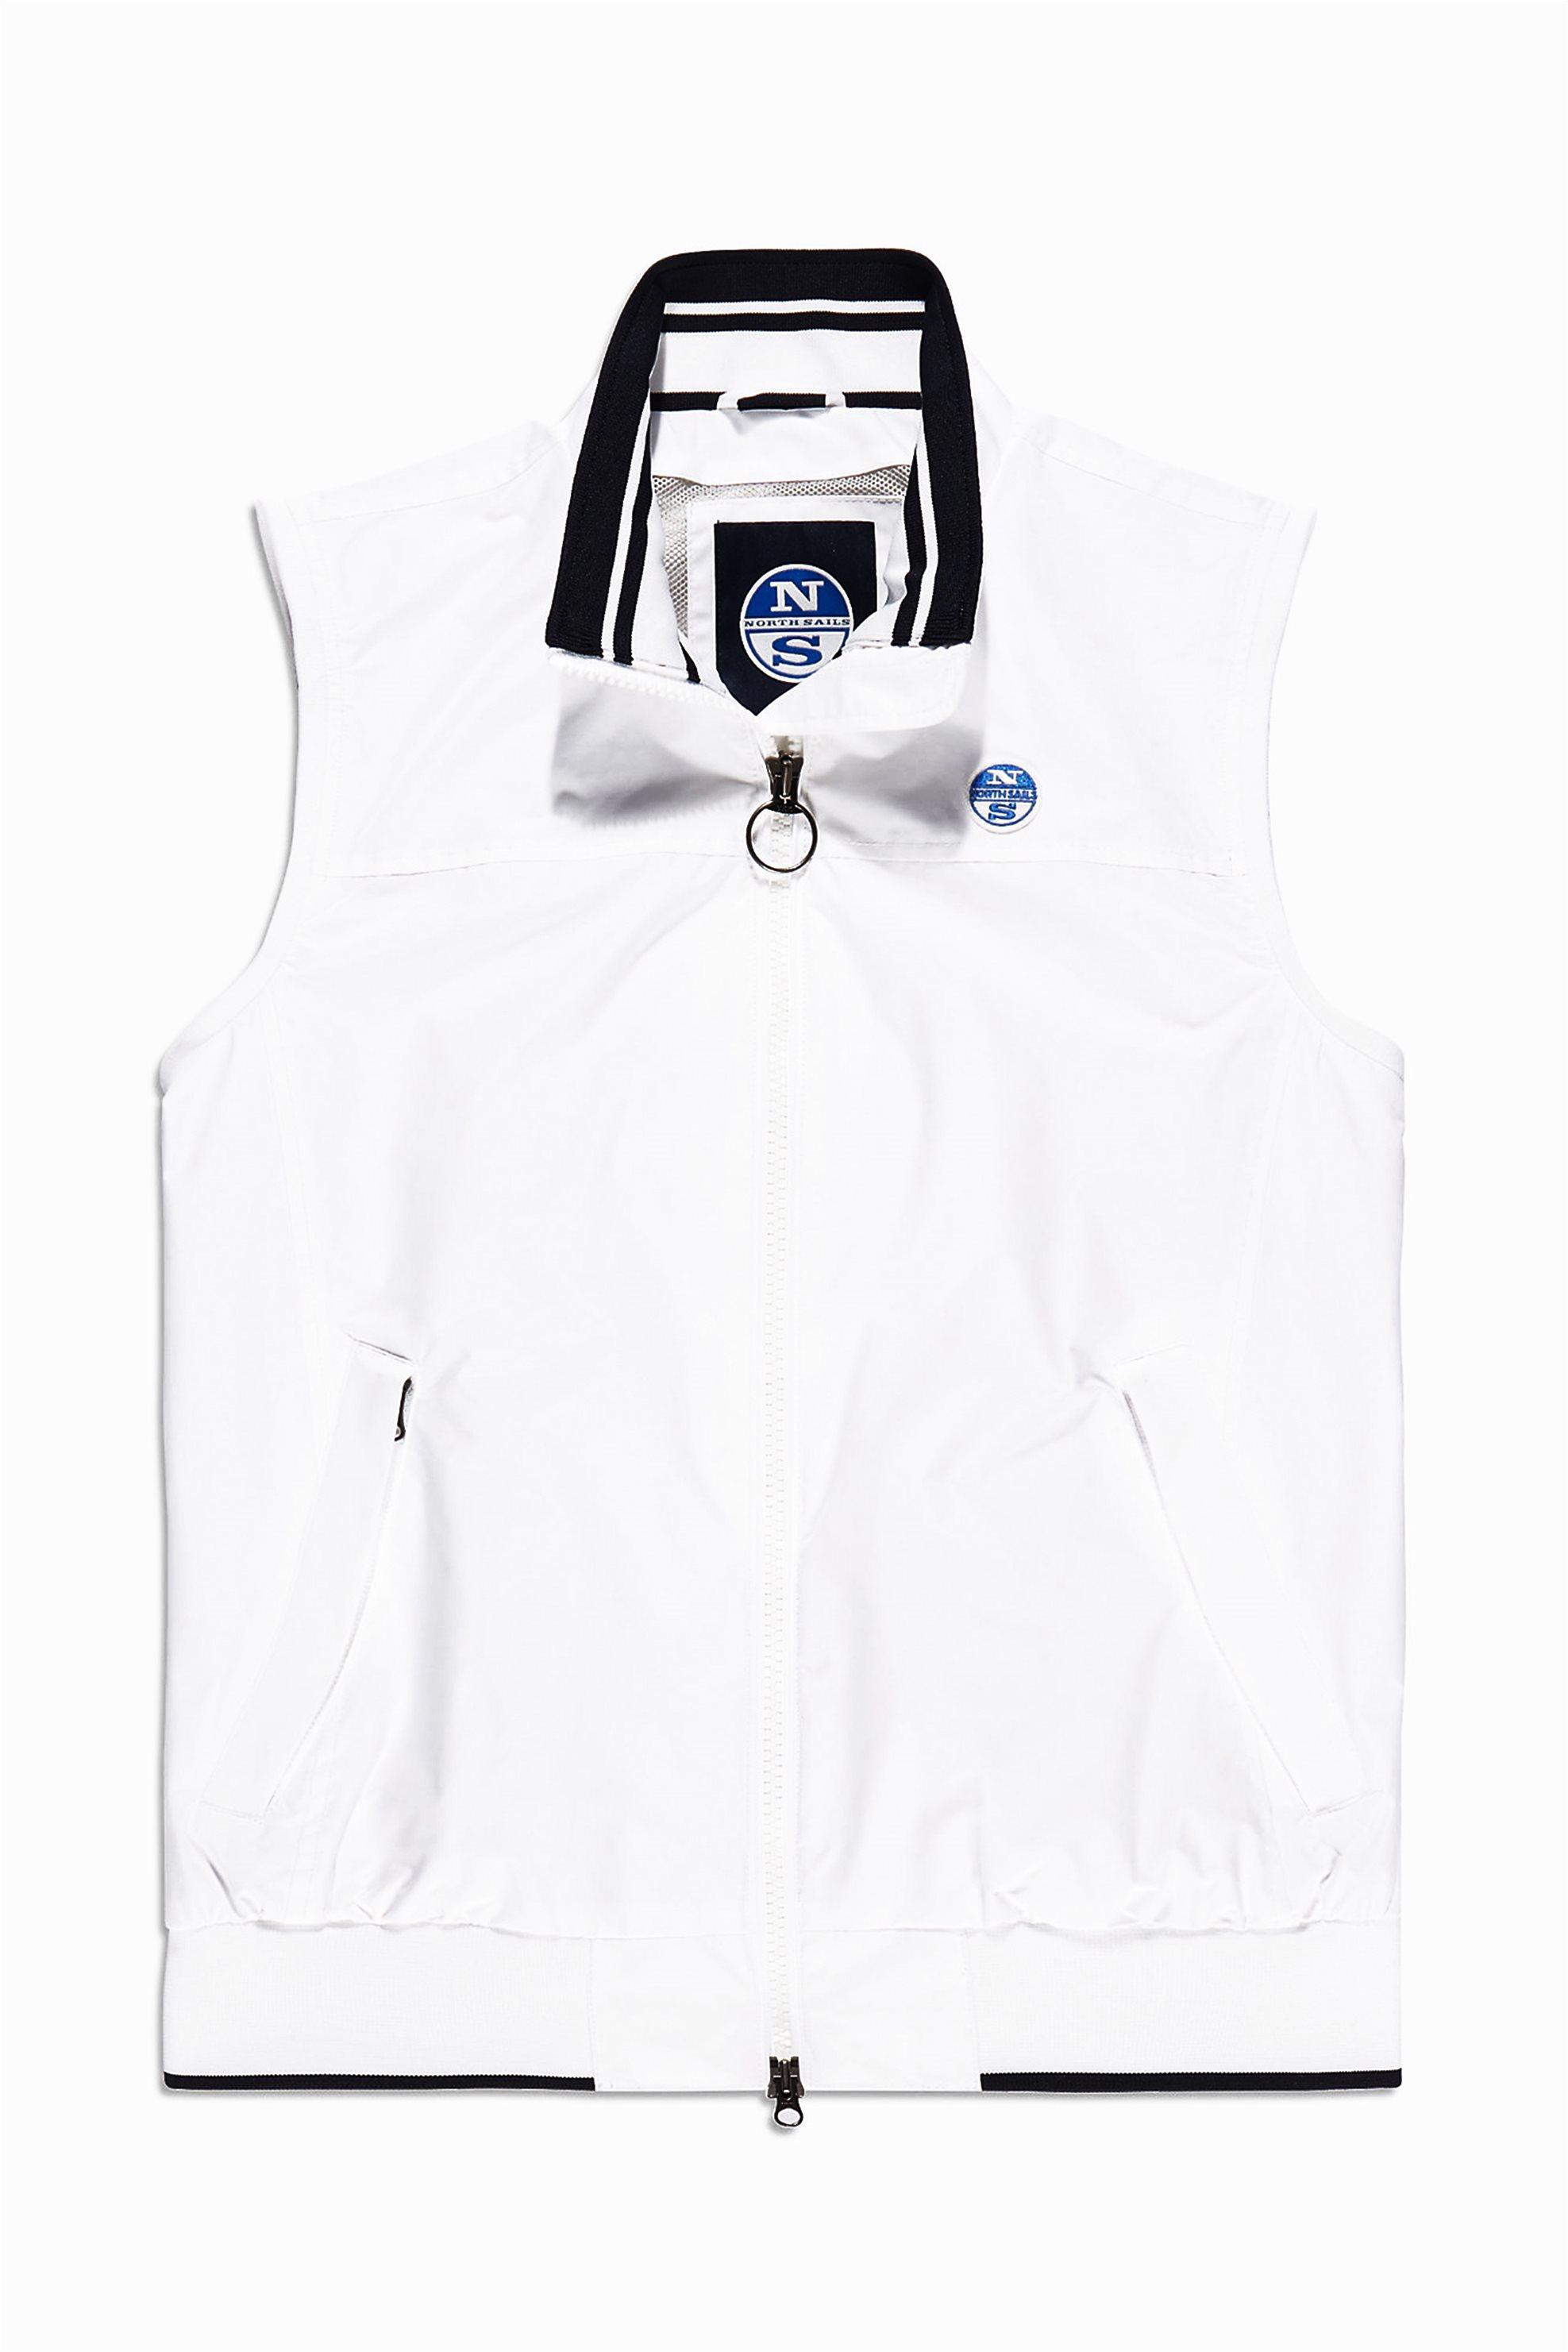 ca8c0ee80cd6 Notos North Sales ανδρικό μπουφάν αμάνικο Slim Vest - 602658 - Λευκό